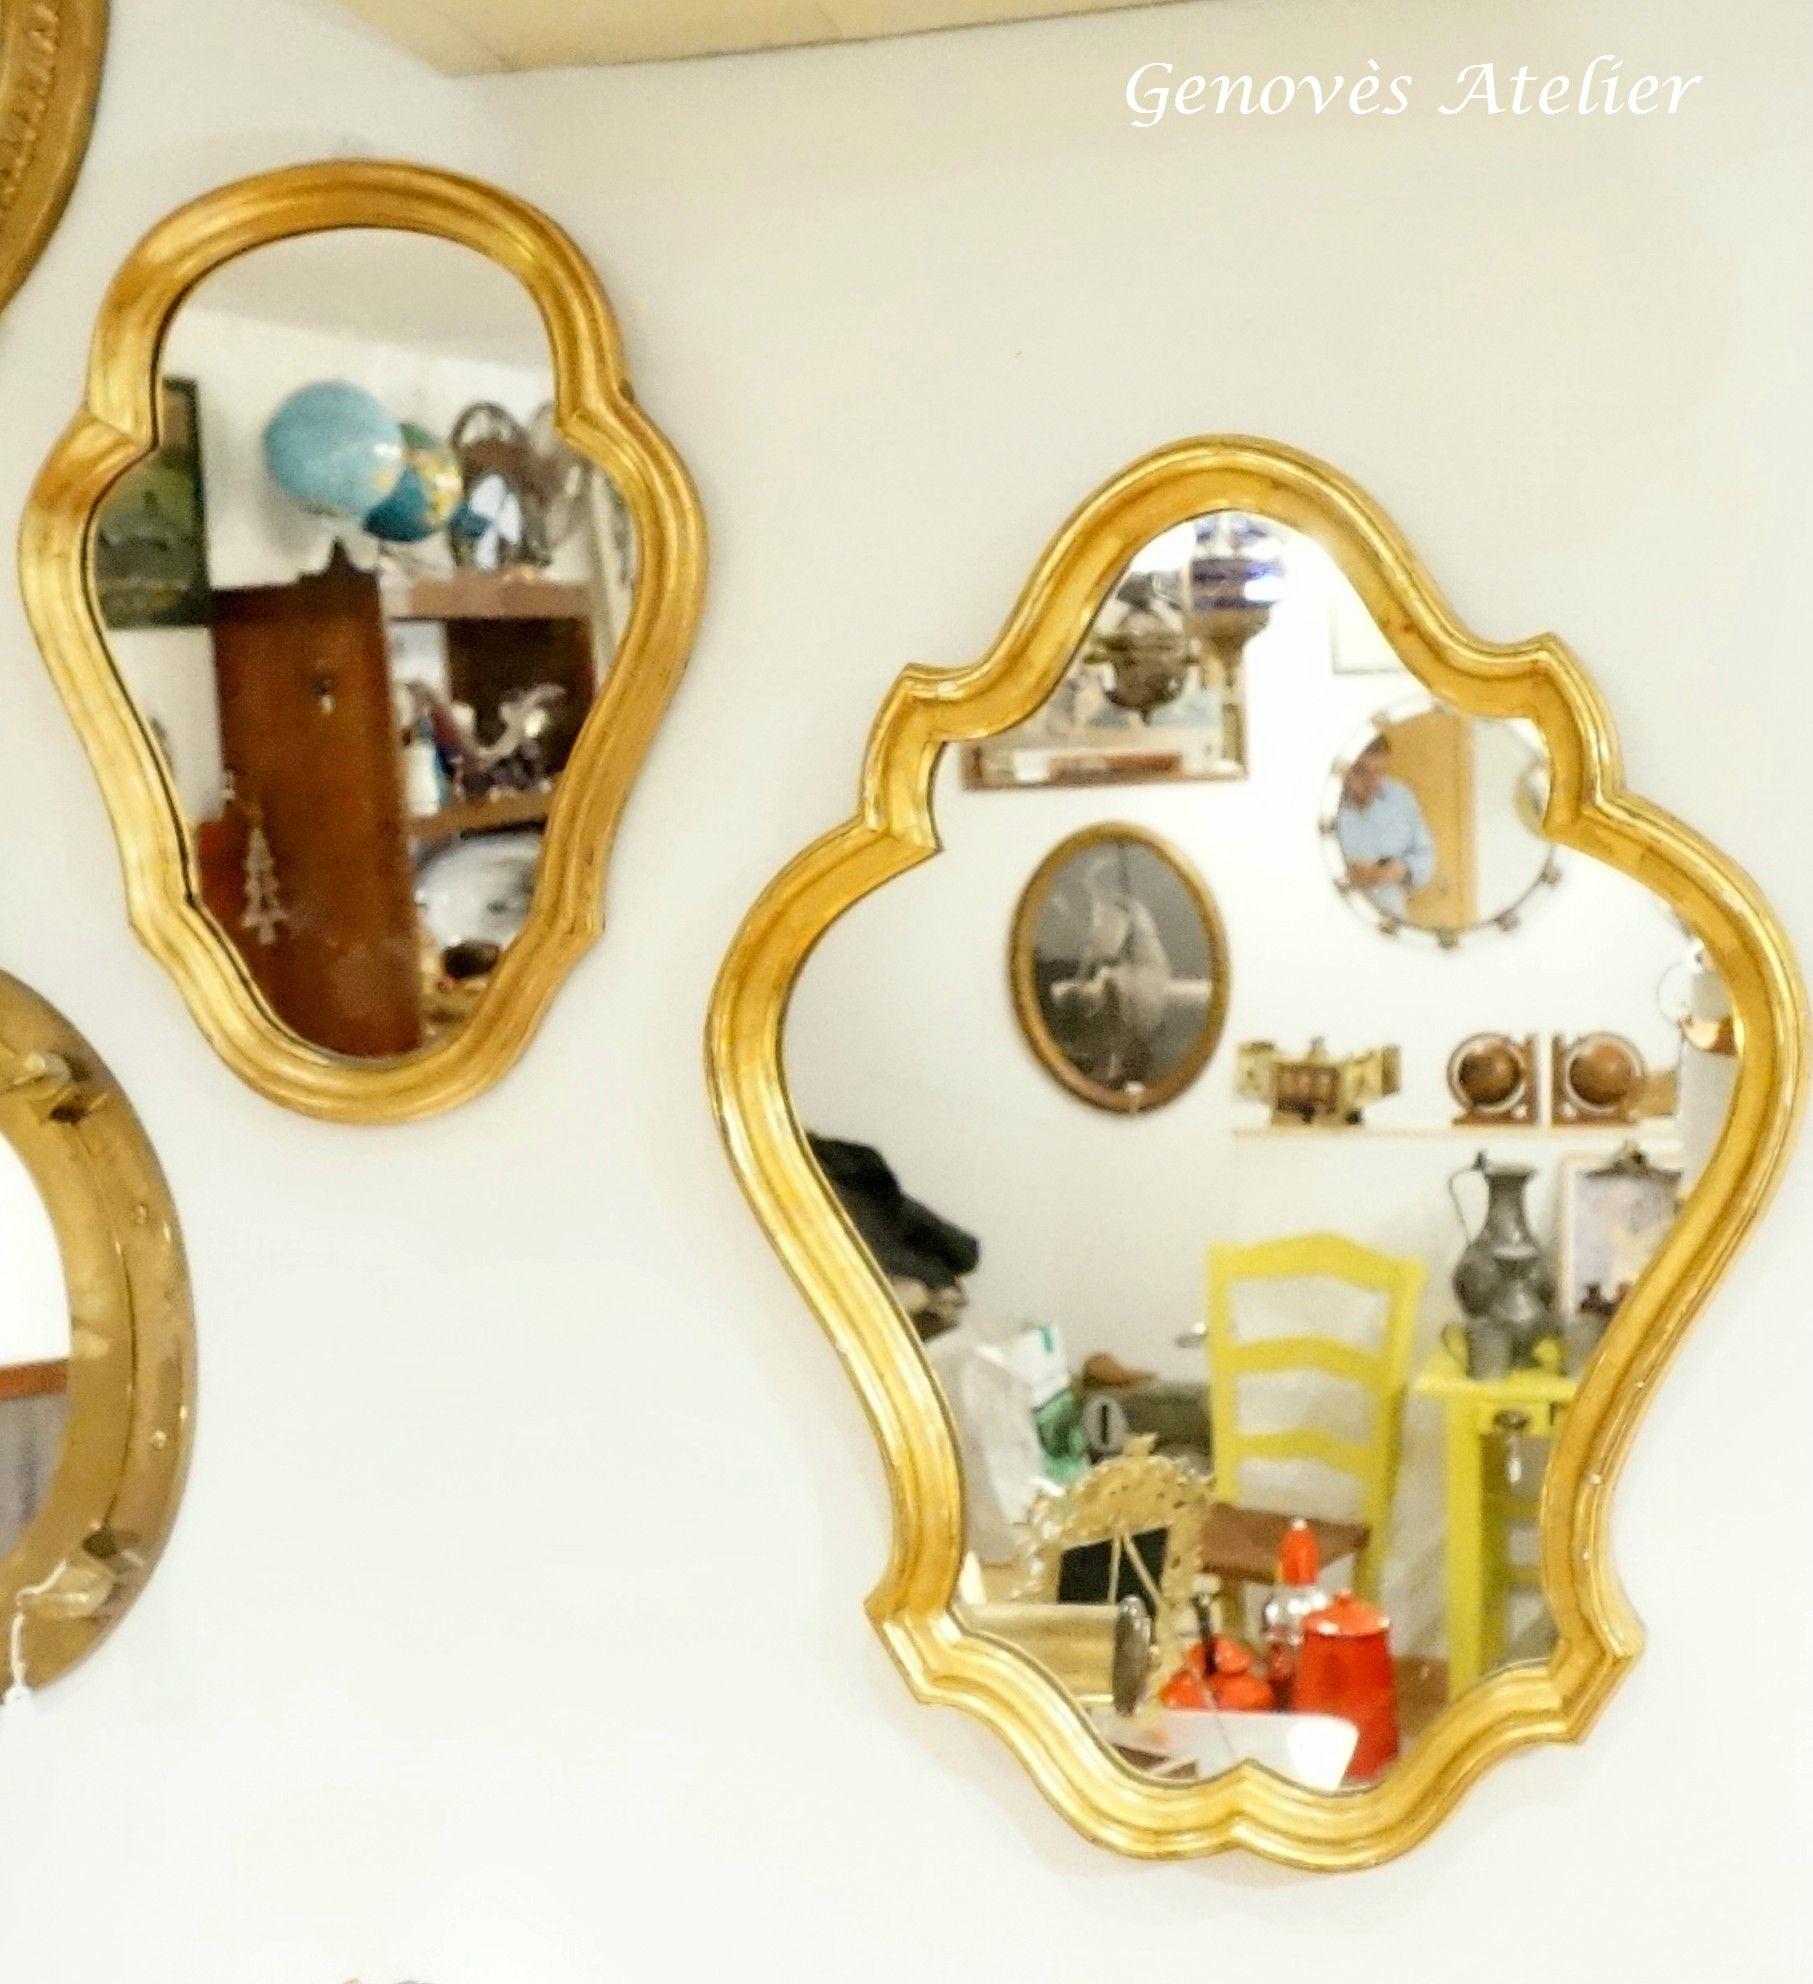 Pareja de espejos de estilo frances 6 Genoves Atelier